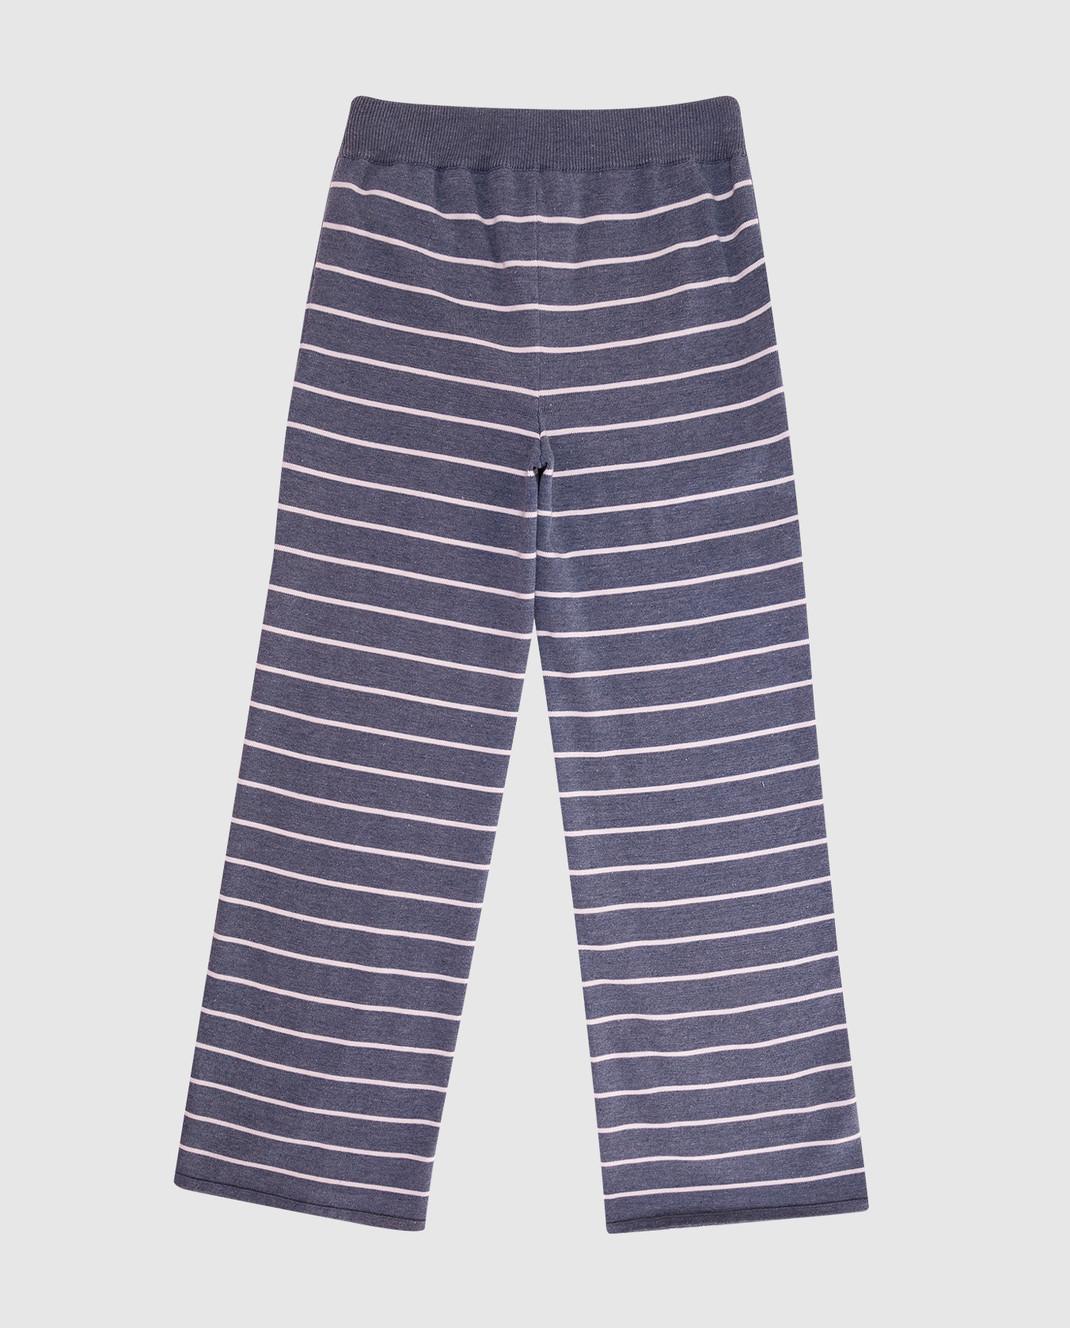 Loro Piana Детские серые брюки F1FAI0610 изображение 2